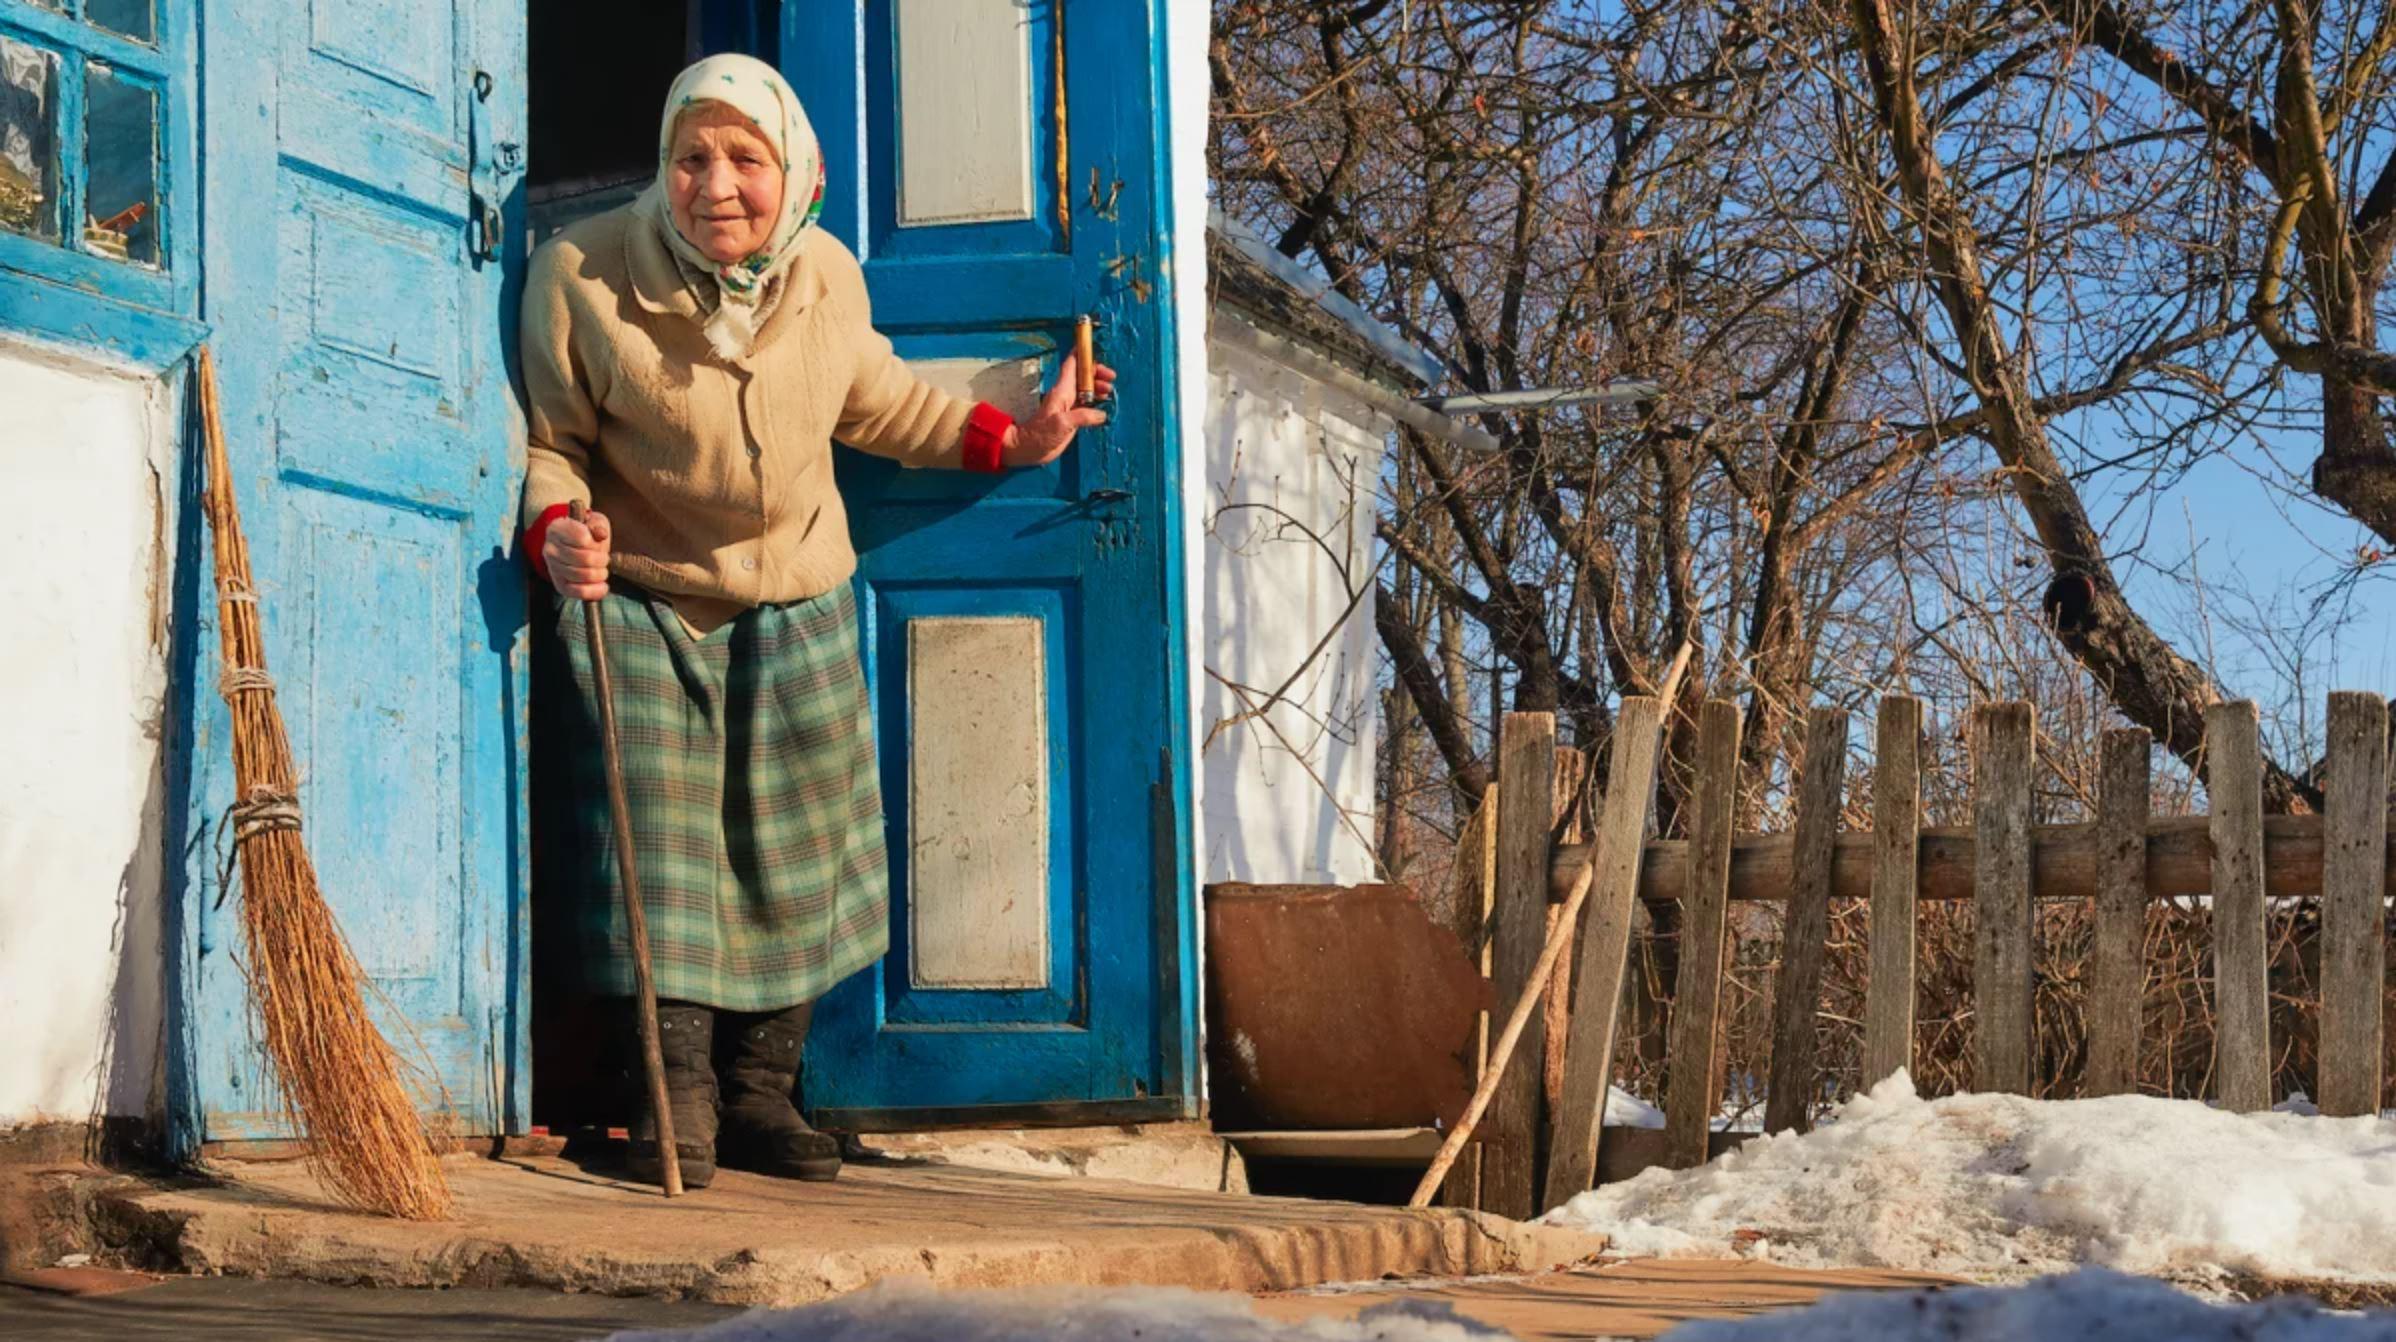 Voedselpakketten Oekraïne